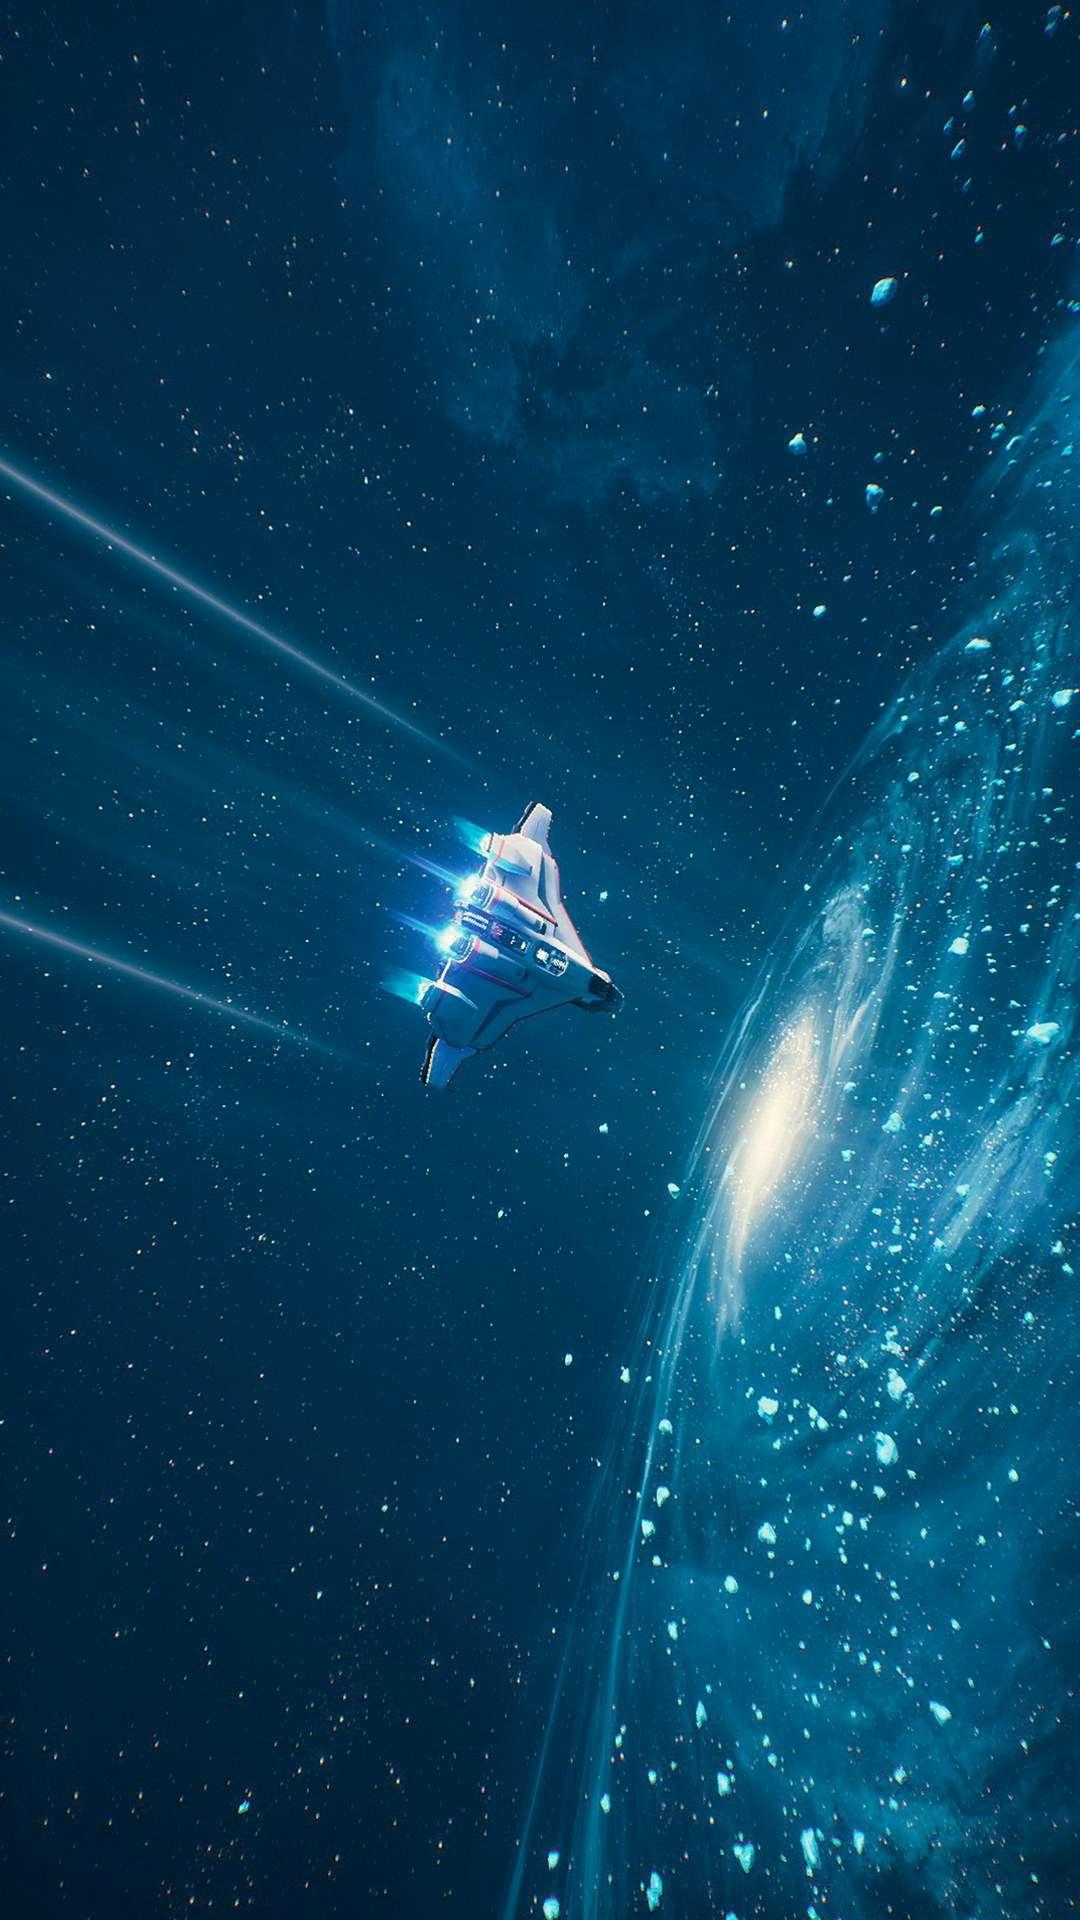 SpaceShip Interstellar Space iPhone Wallpaper